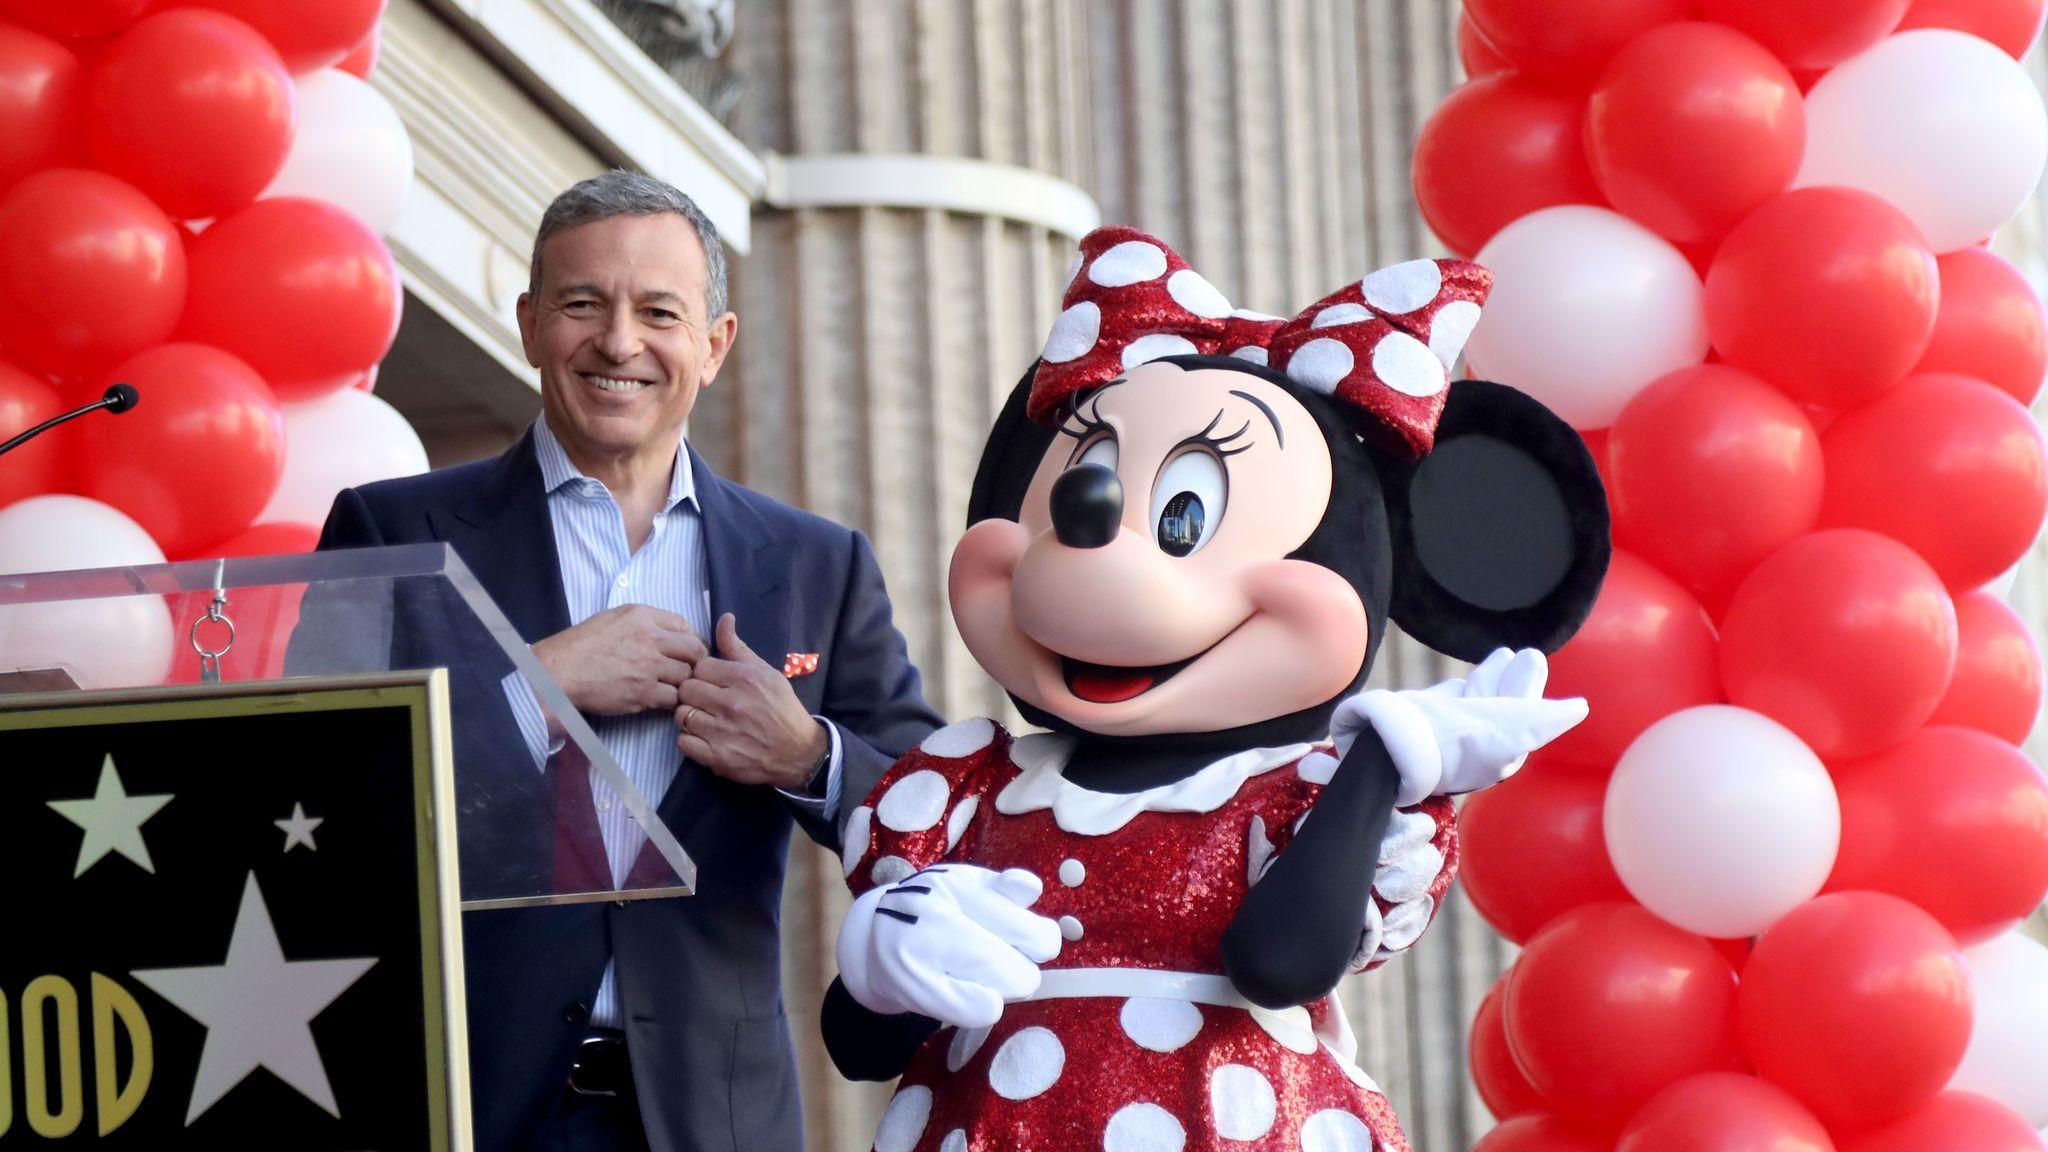 Disney Chief Executive Bob Iger